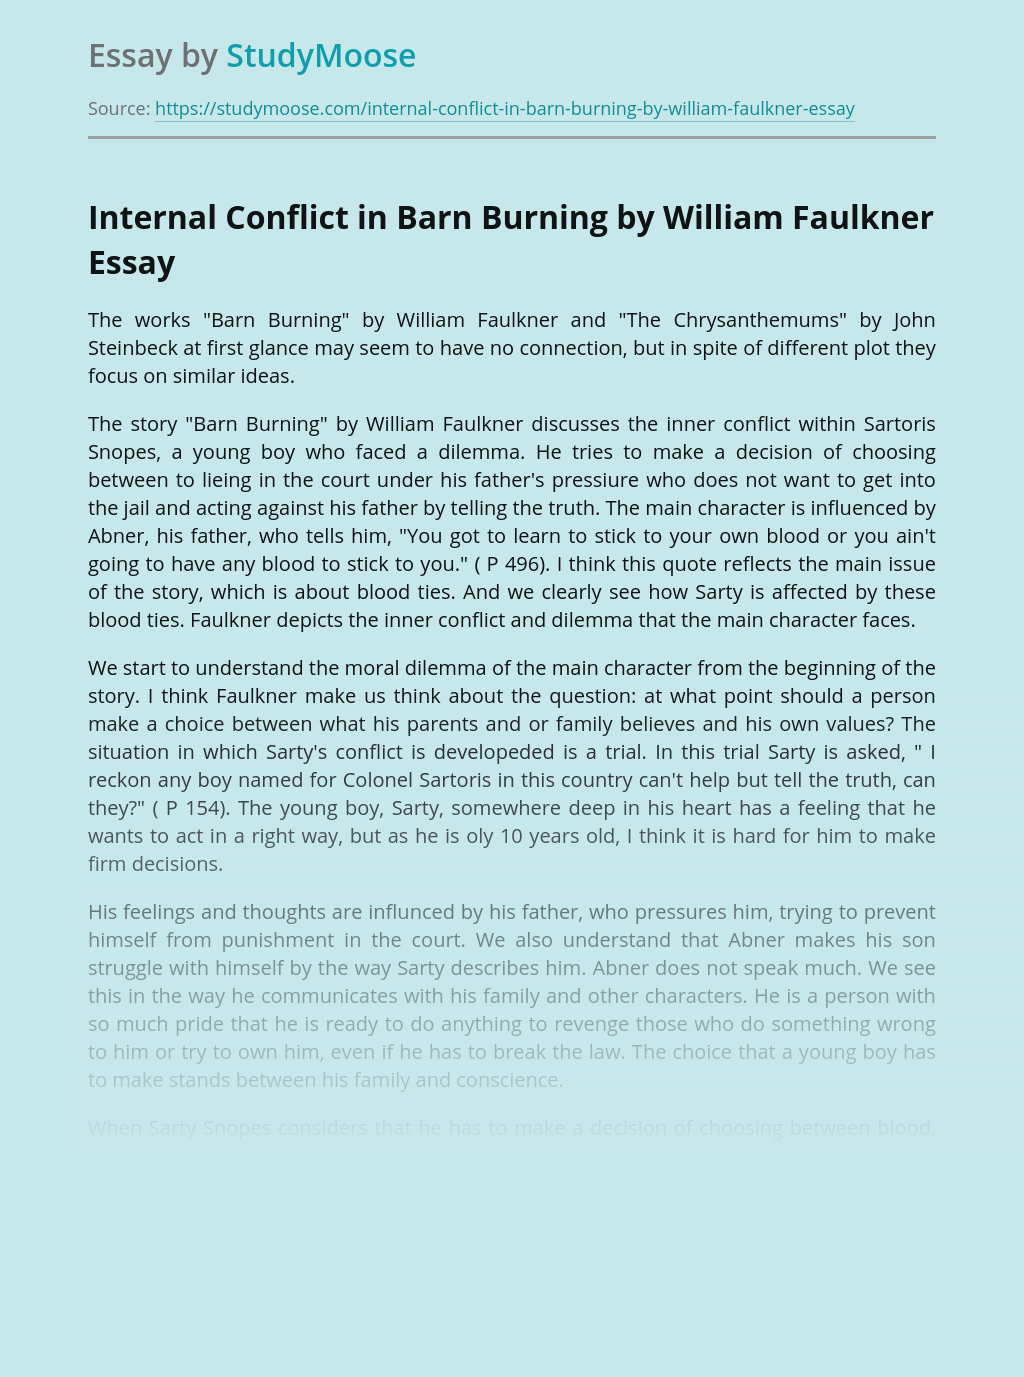 Internal Conflict in Barn Burning by William Faulkner